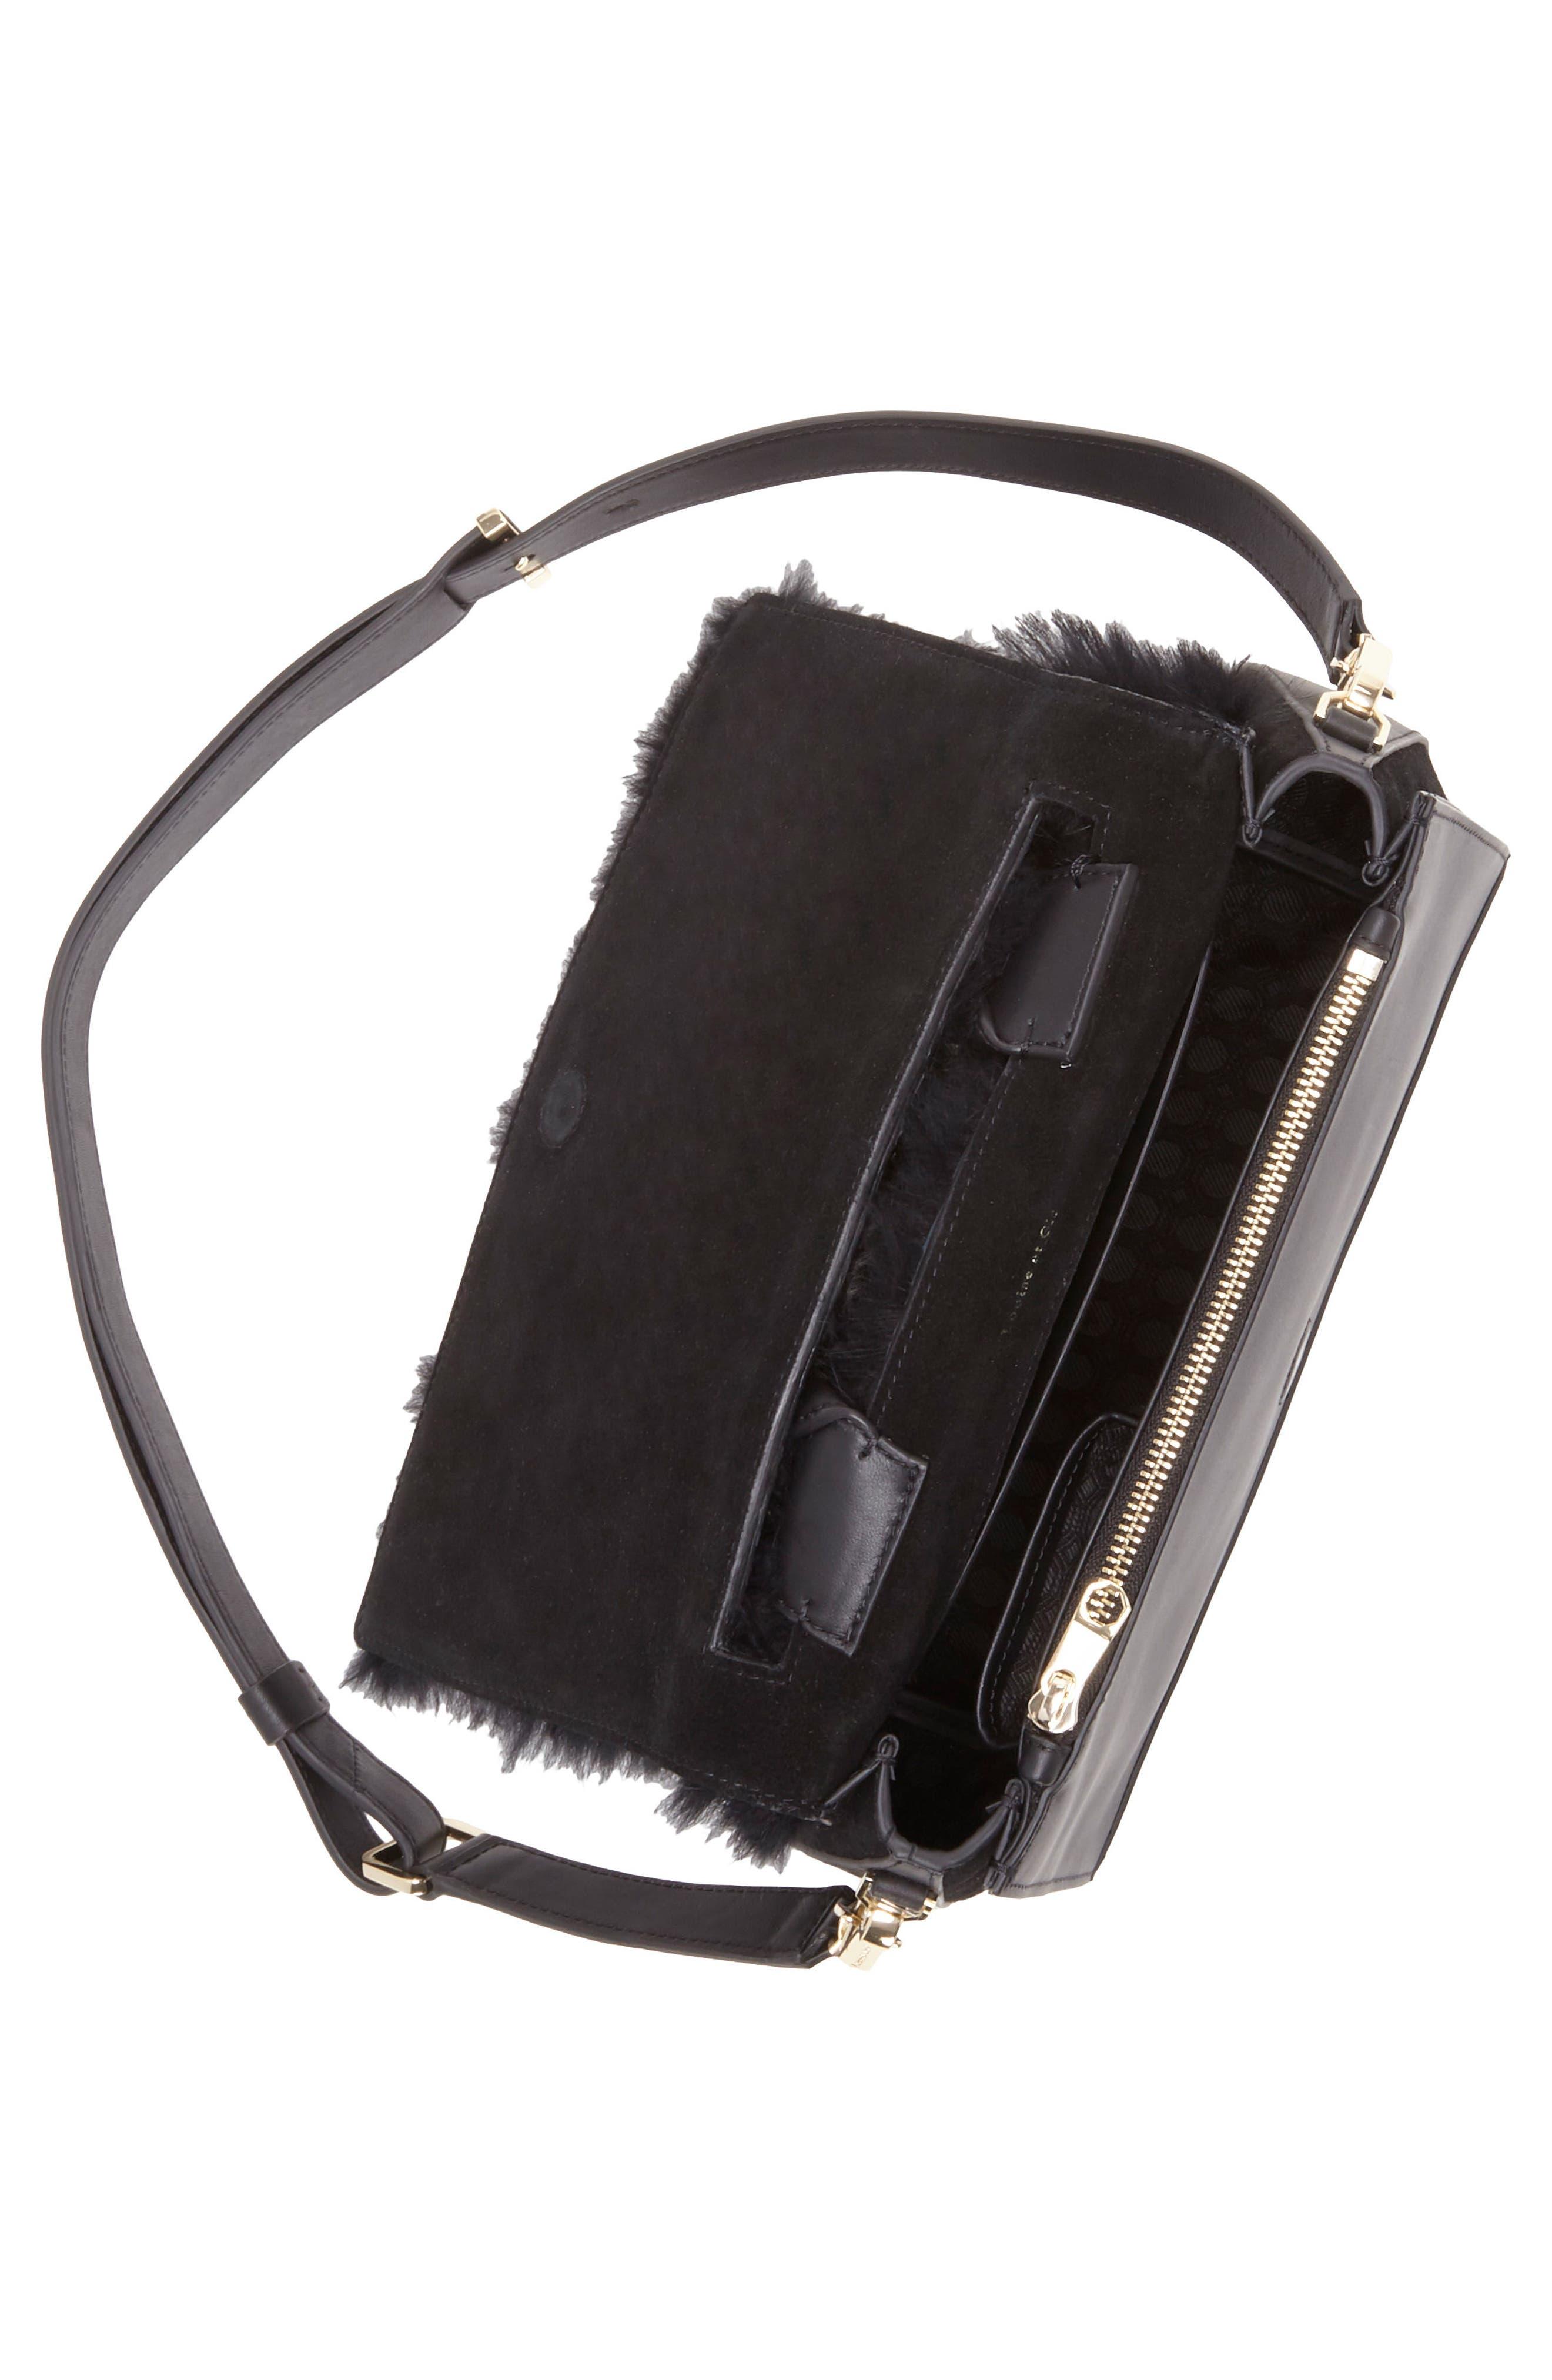 Tysse Leather & Genuine Rabbit Fur Satchel,                             Alternate thumbnail 3, color,                             Black